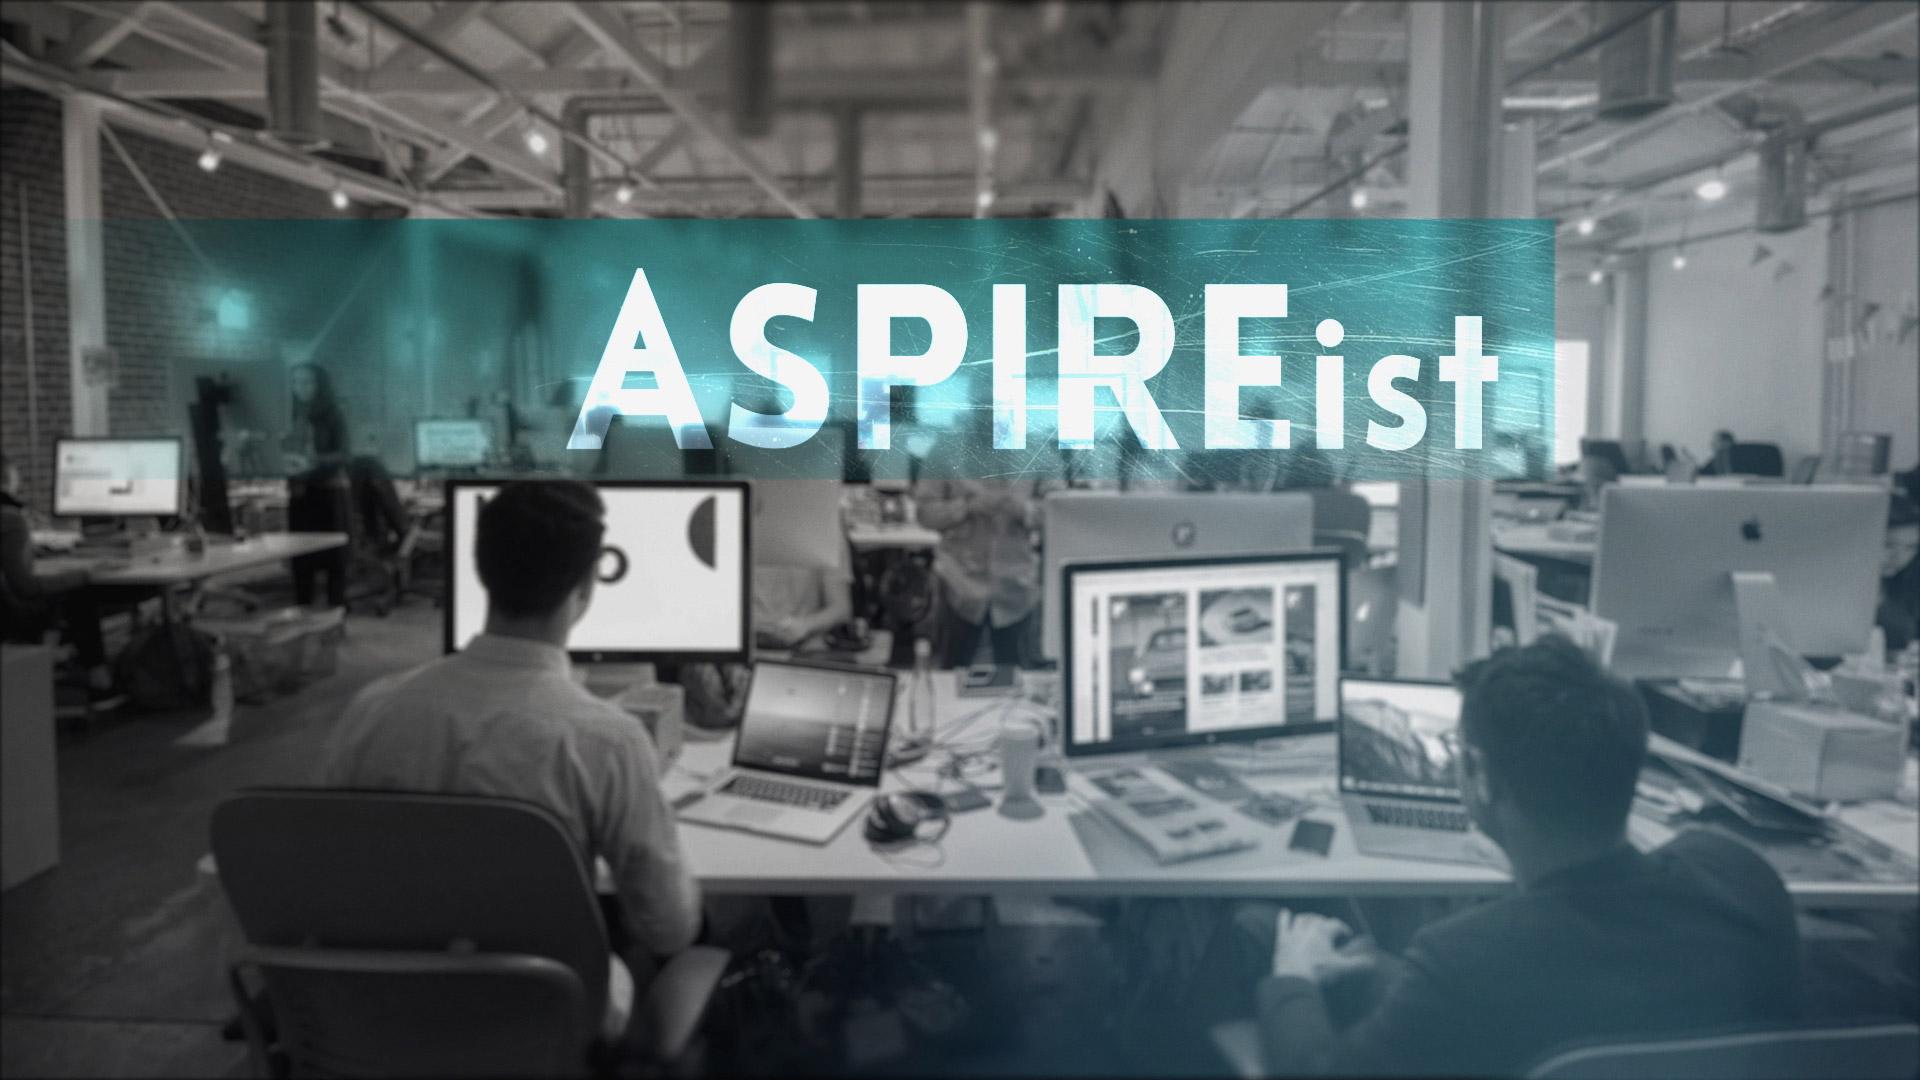 ASPIREist S02 | HLN